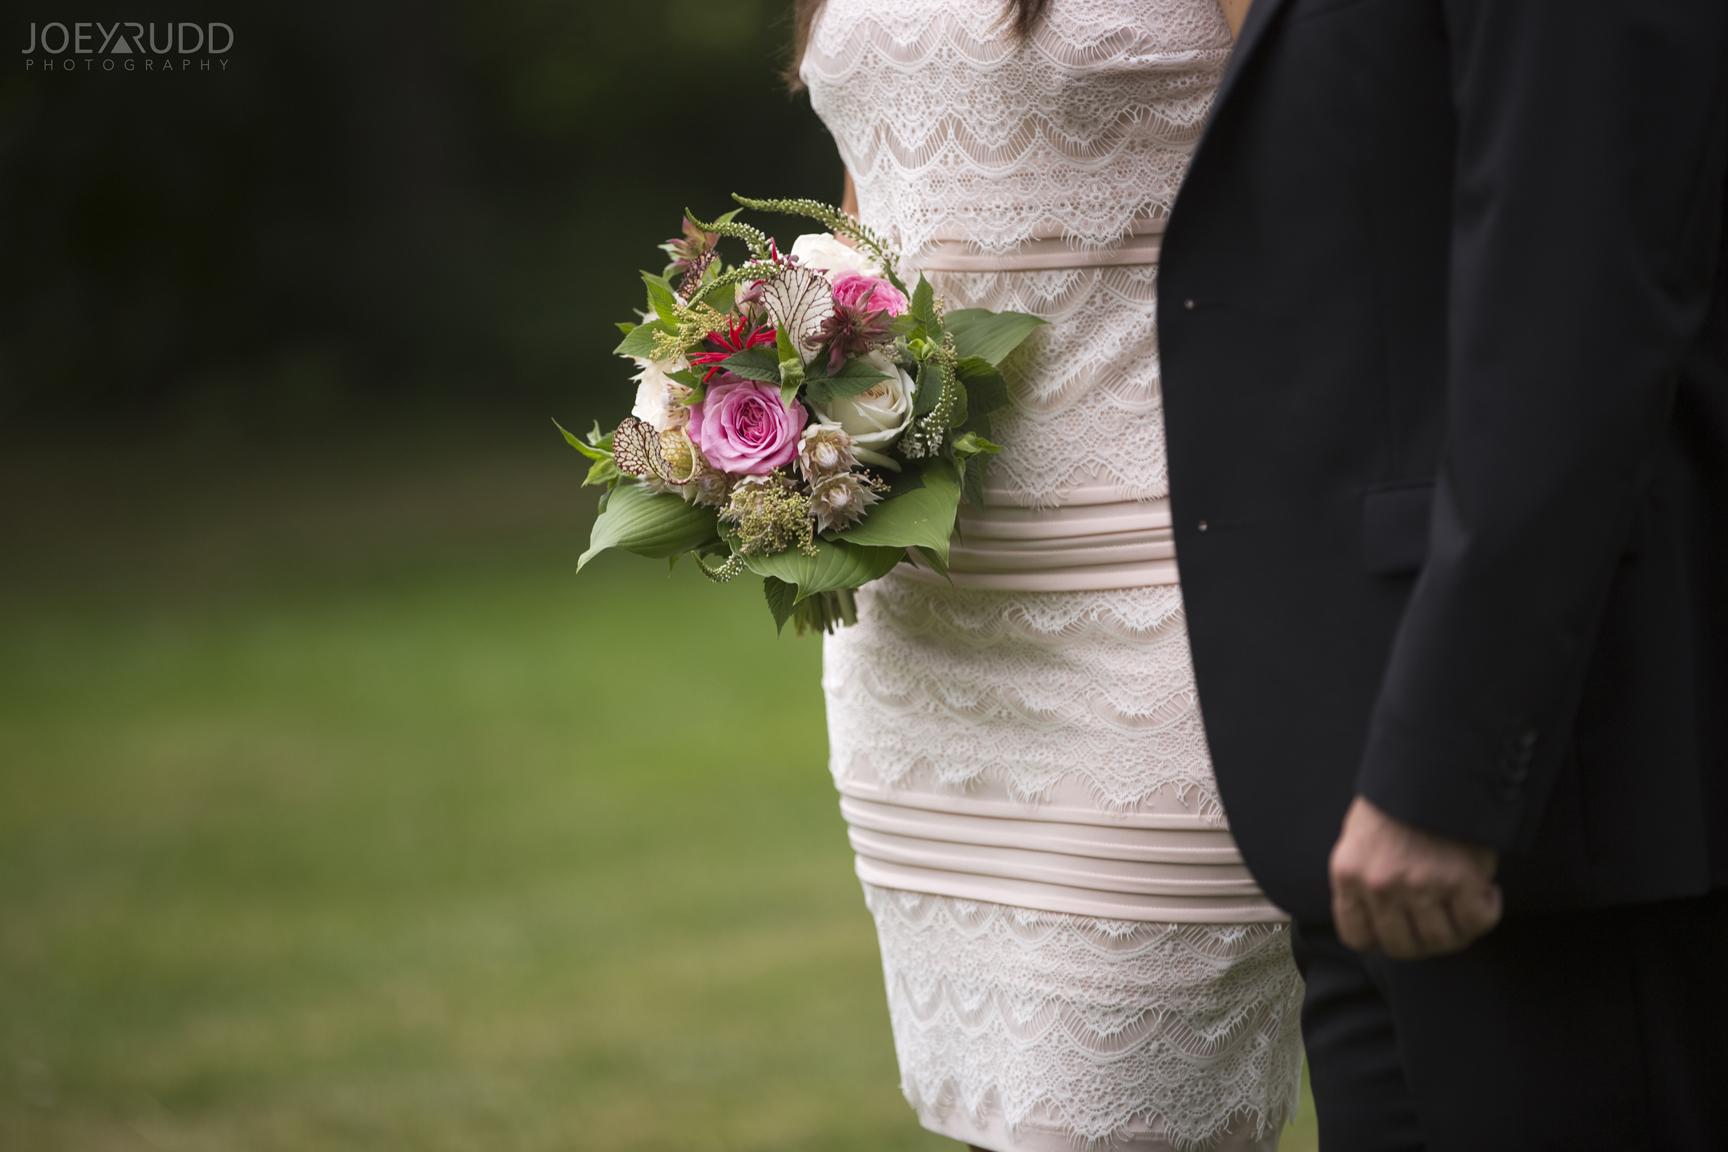 Elopement Wedding by Ottawa Wedding Photographer Joey Rudd Photography Arboretum Flowers Bouquet